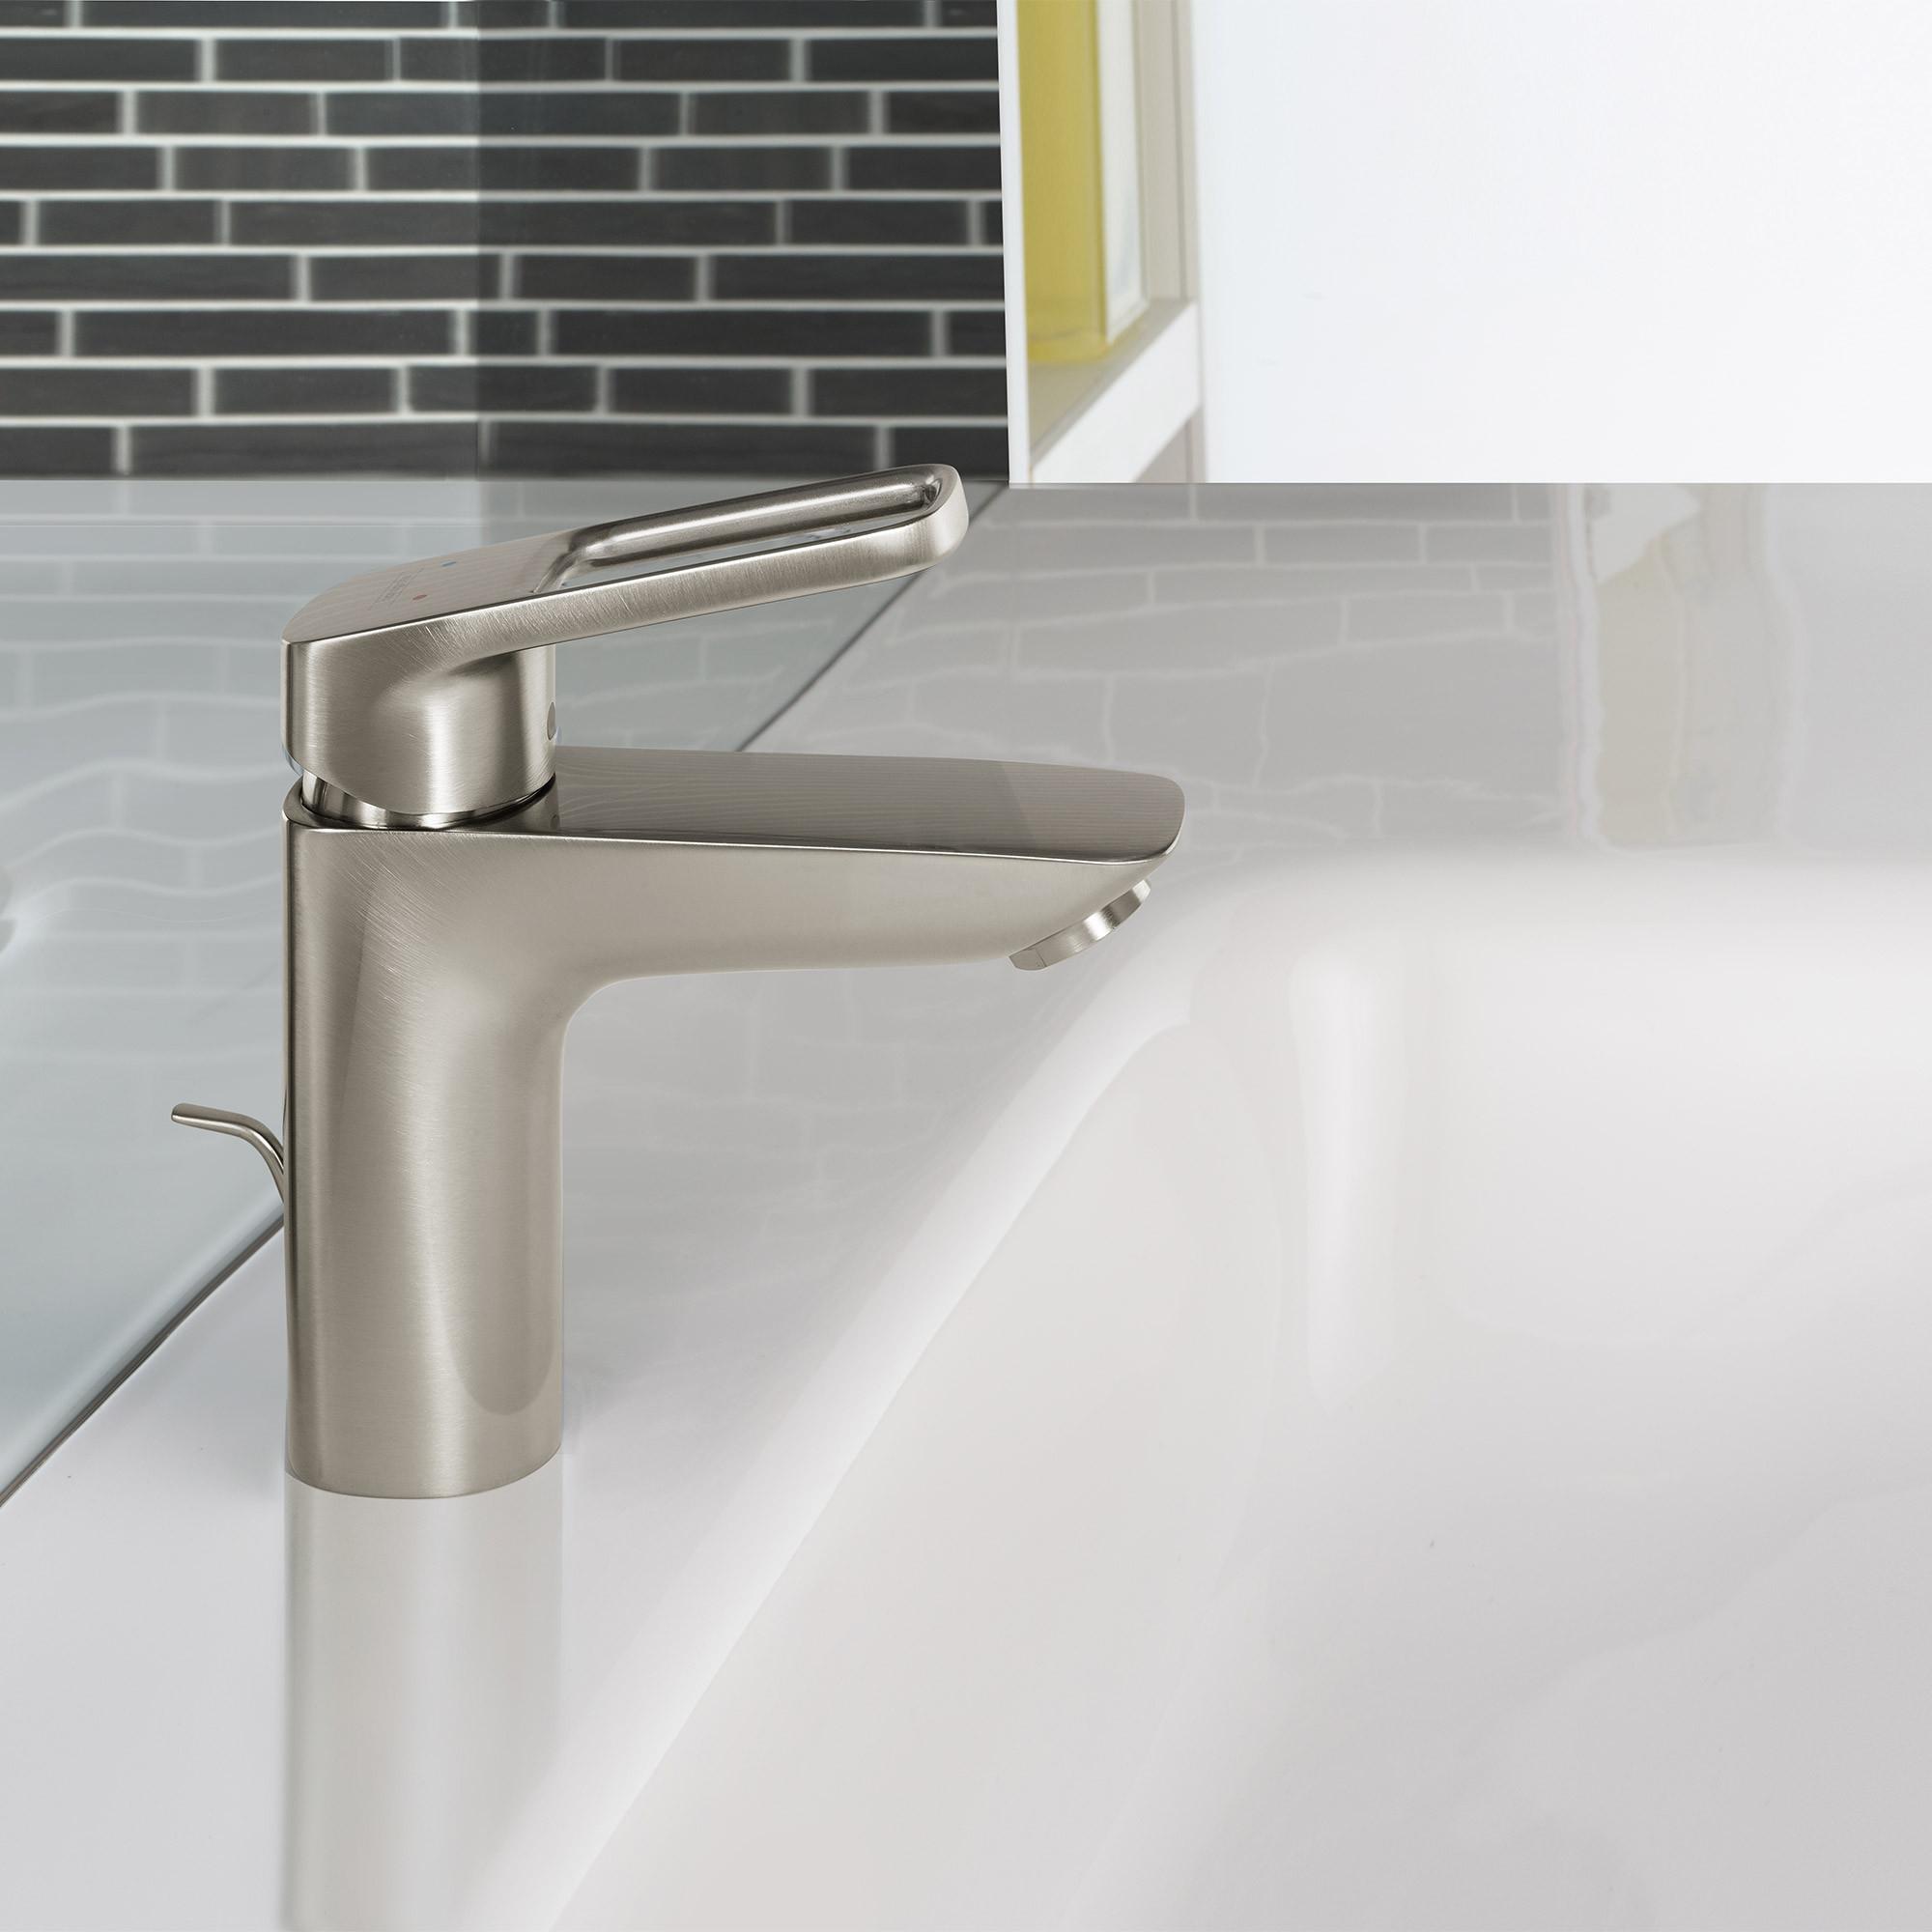 Hansgrohe Logis Loop Single Hole Bathroom Faucet Brushed Nickel with regard to measurements 2000 X 2000